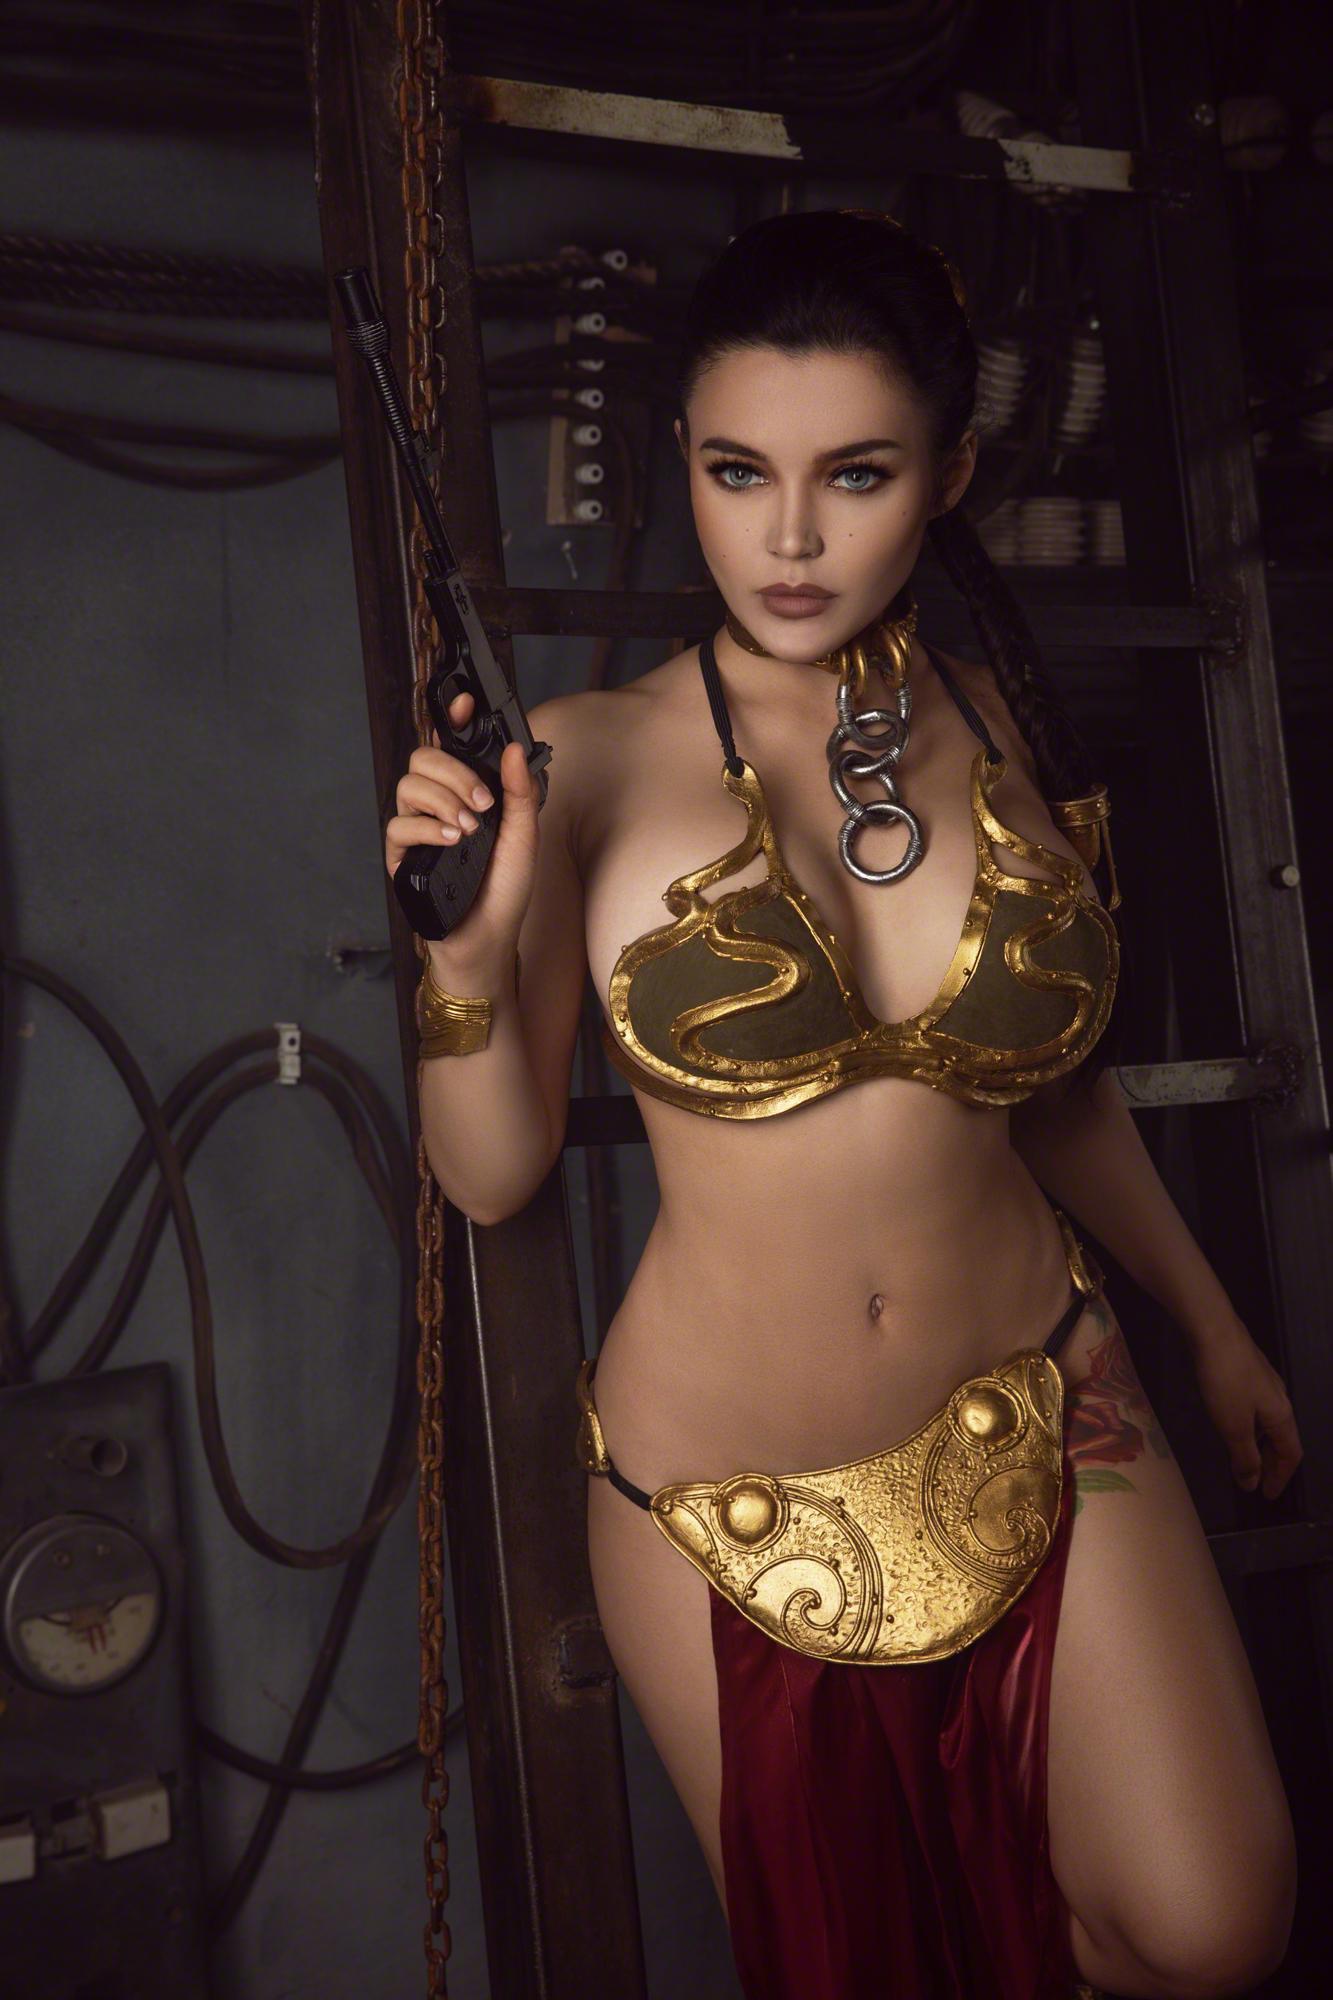 Kalinka Fox Princess Leia Slave Cosplay Set Leaked Exjawi